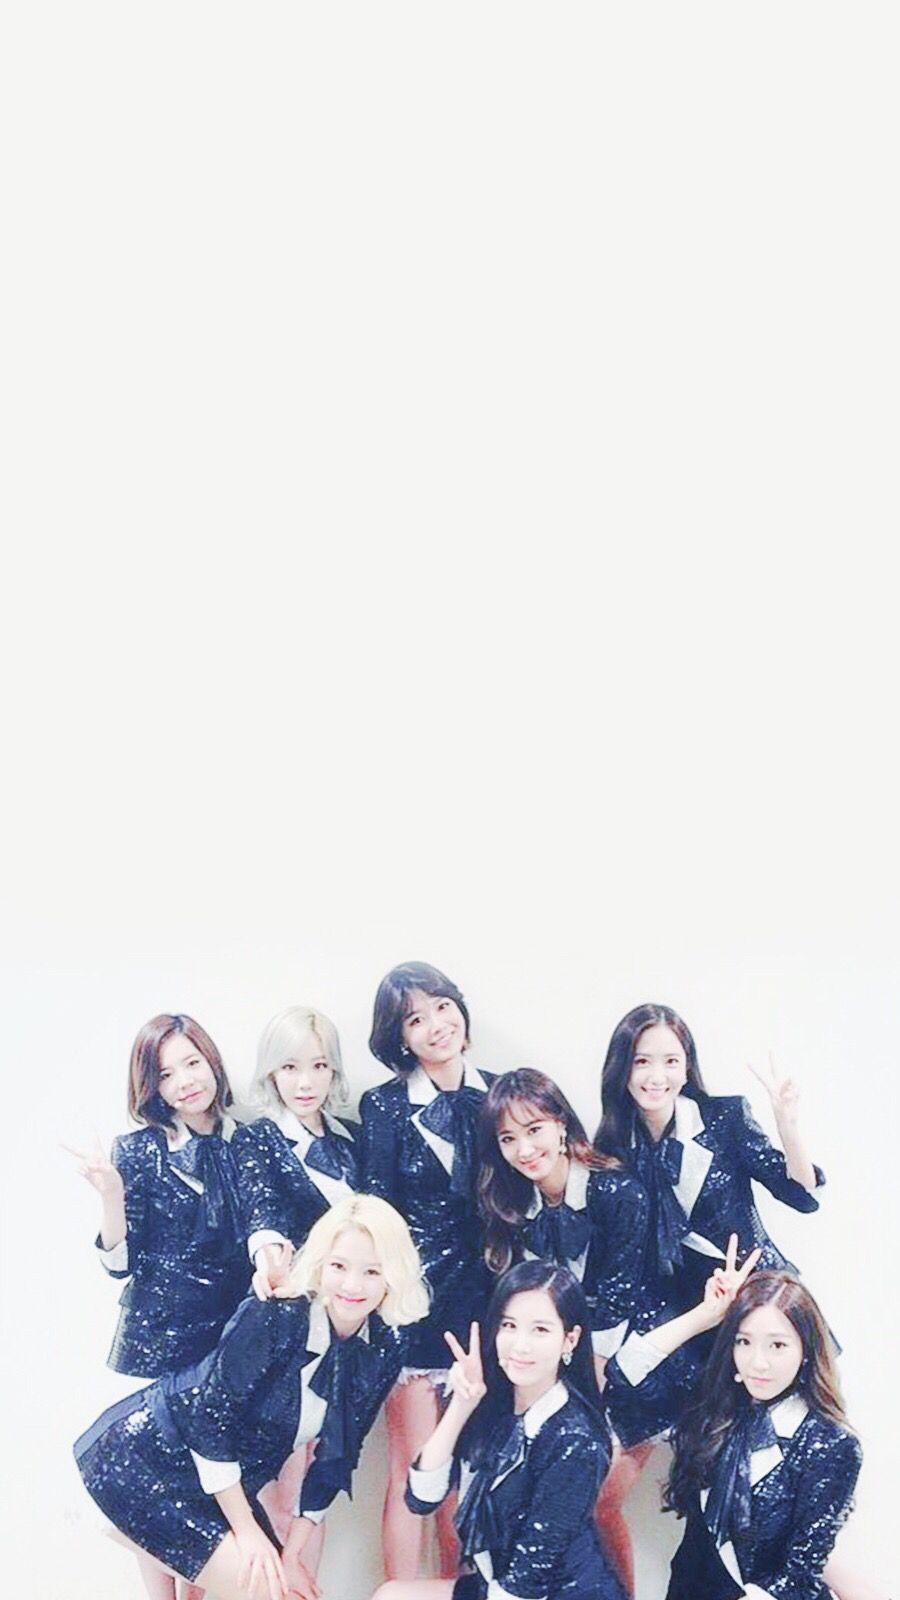 Girls Generation The 4th Tour Phantasia In Taiwan Snsd Iphone Wallpaper Girls Generation Seohyun Yoona